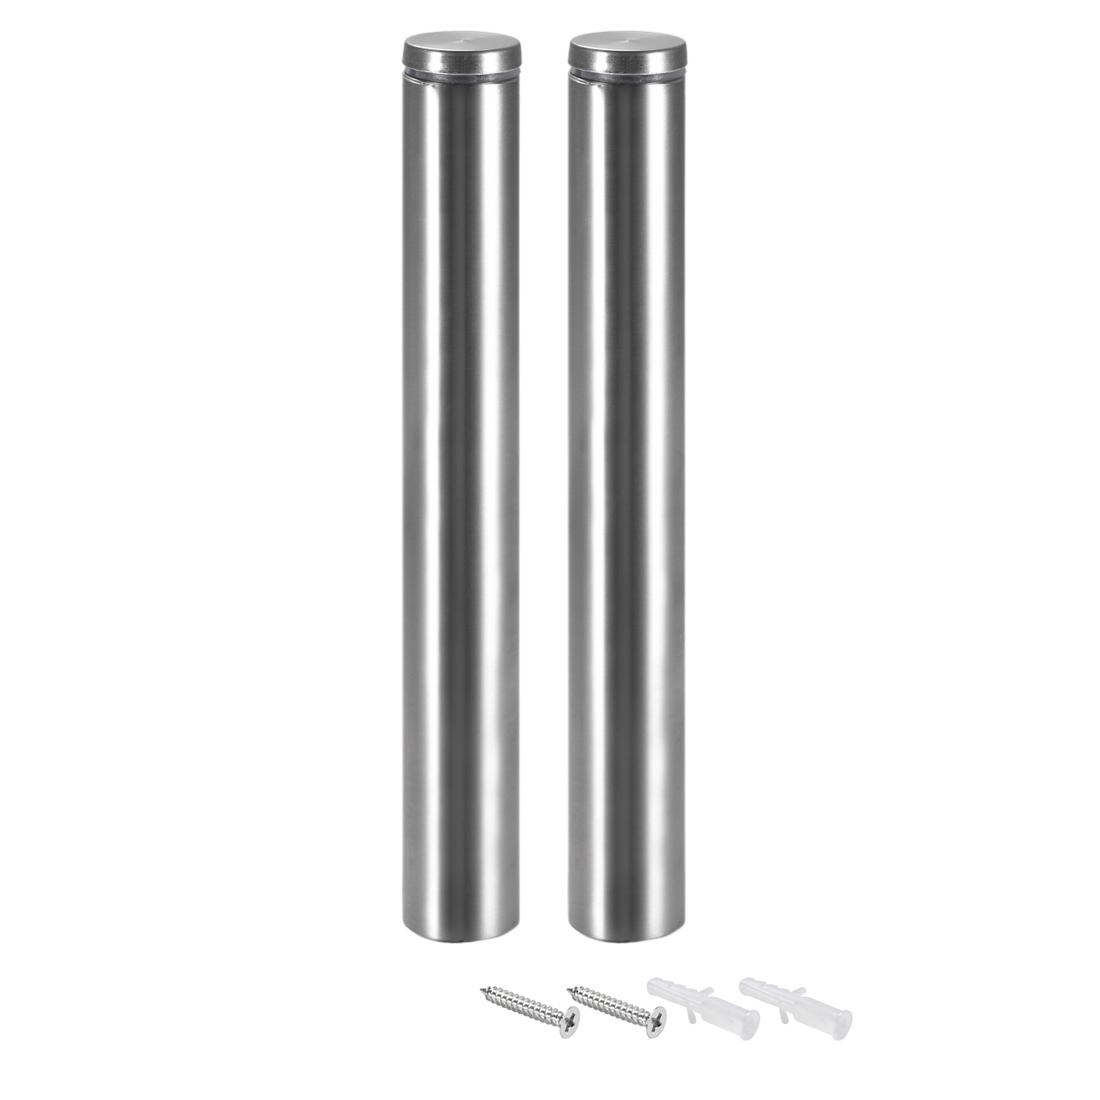 Glass Standoff Mount Stainless Steel Wall Standoff 25mm Dia 202mm Length 2Pcs